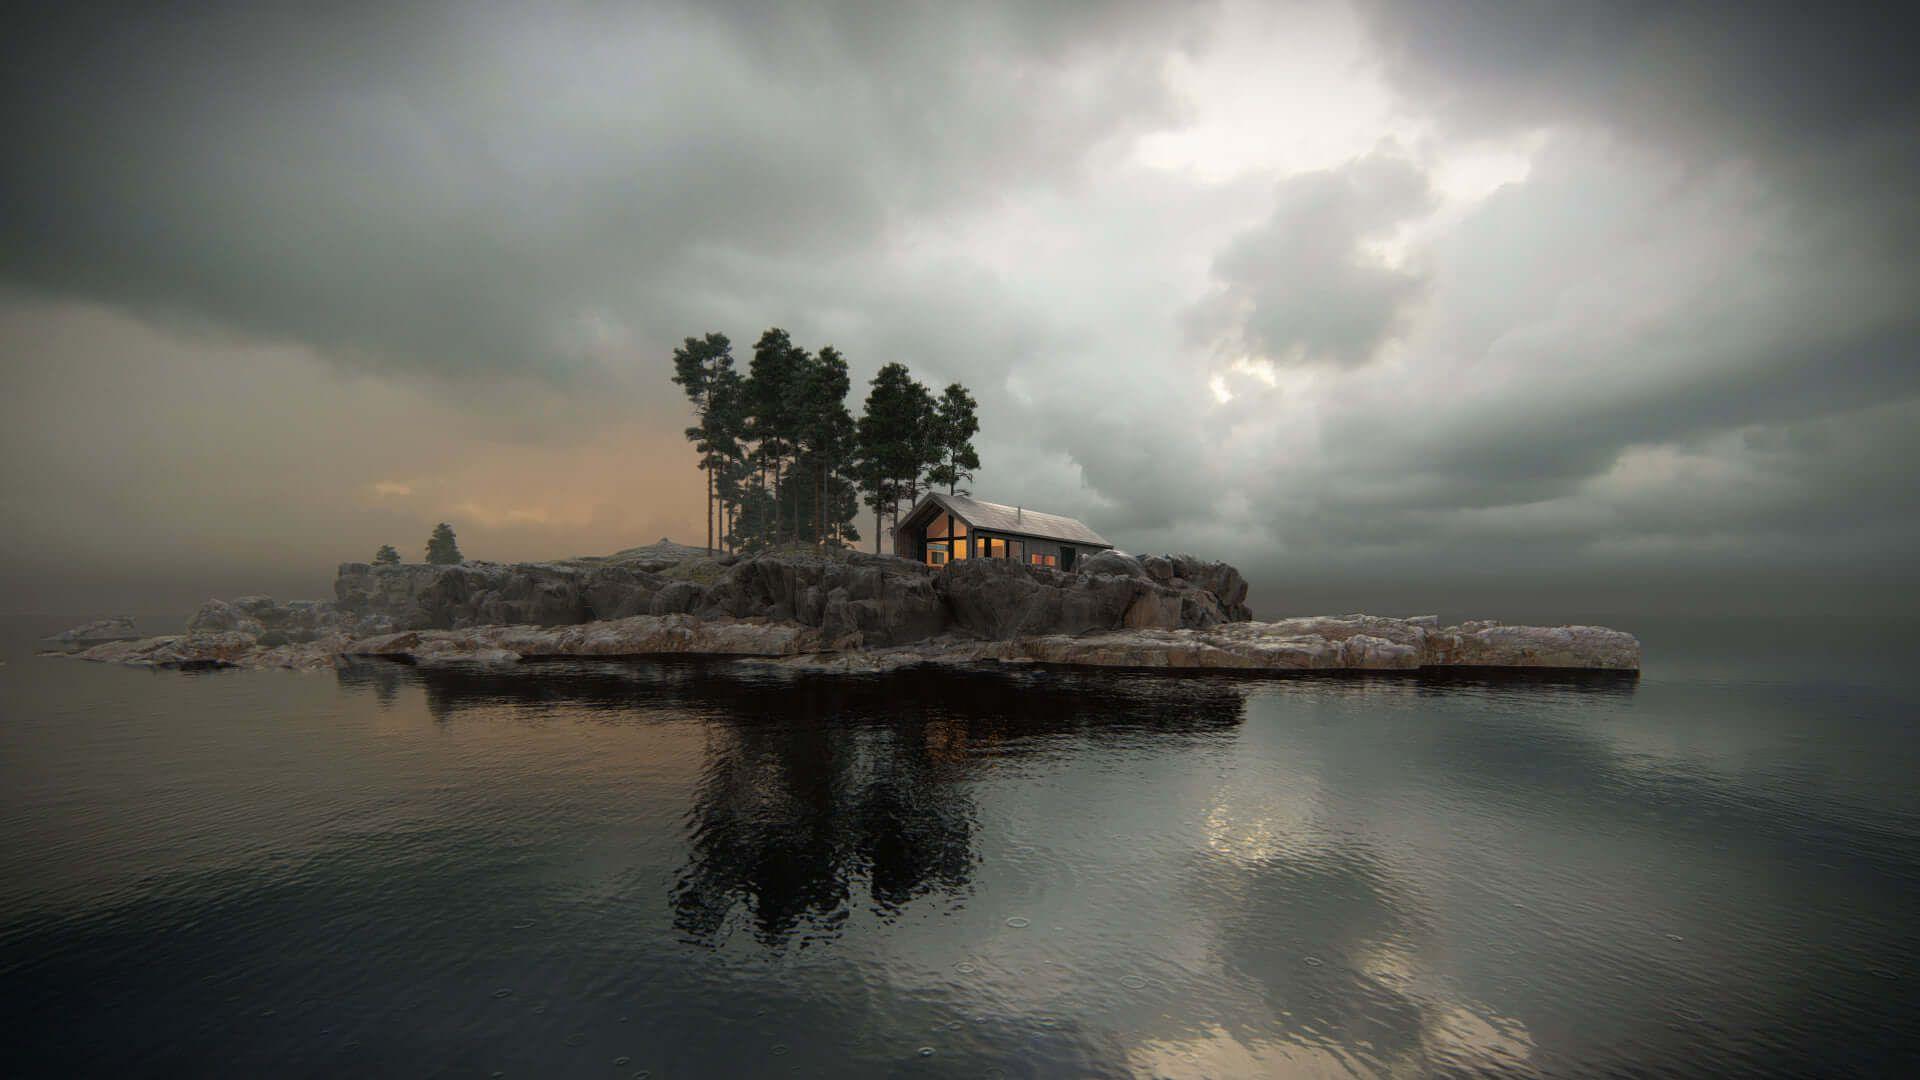 Winter cabin, designed by Vårdal Arkitekter AS and rendered in Lumion 11 by Bartosz Orliński.